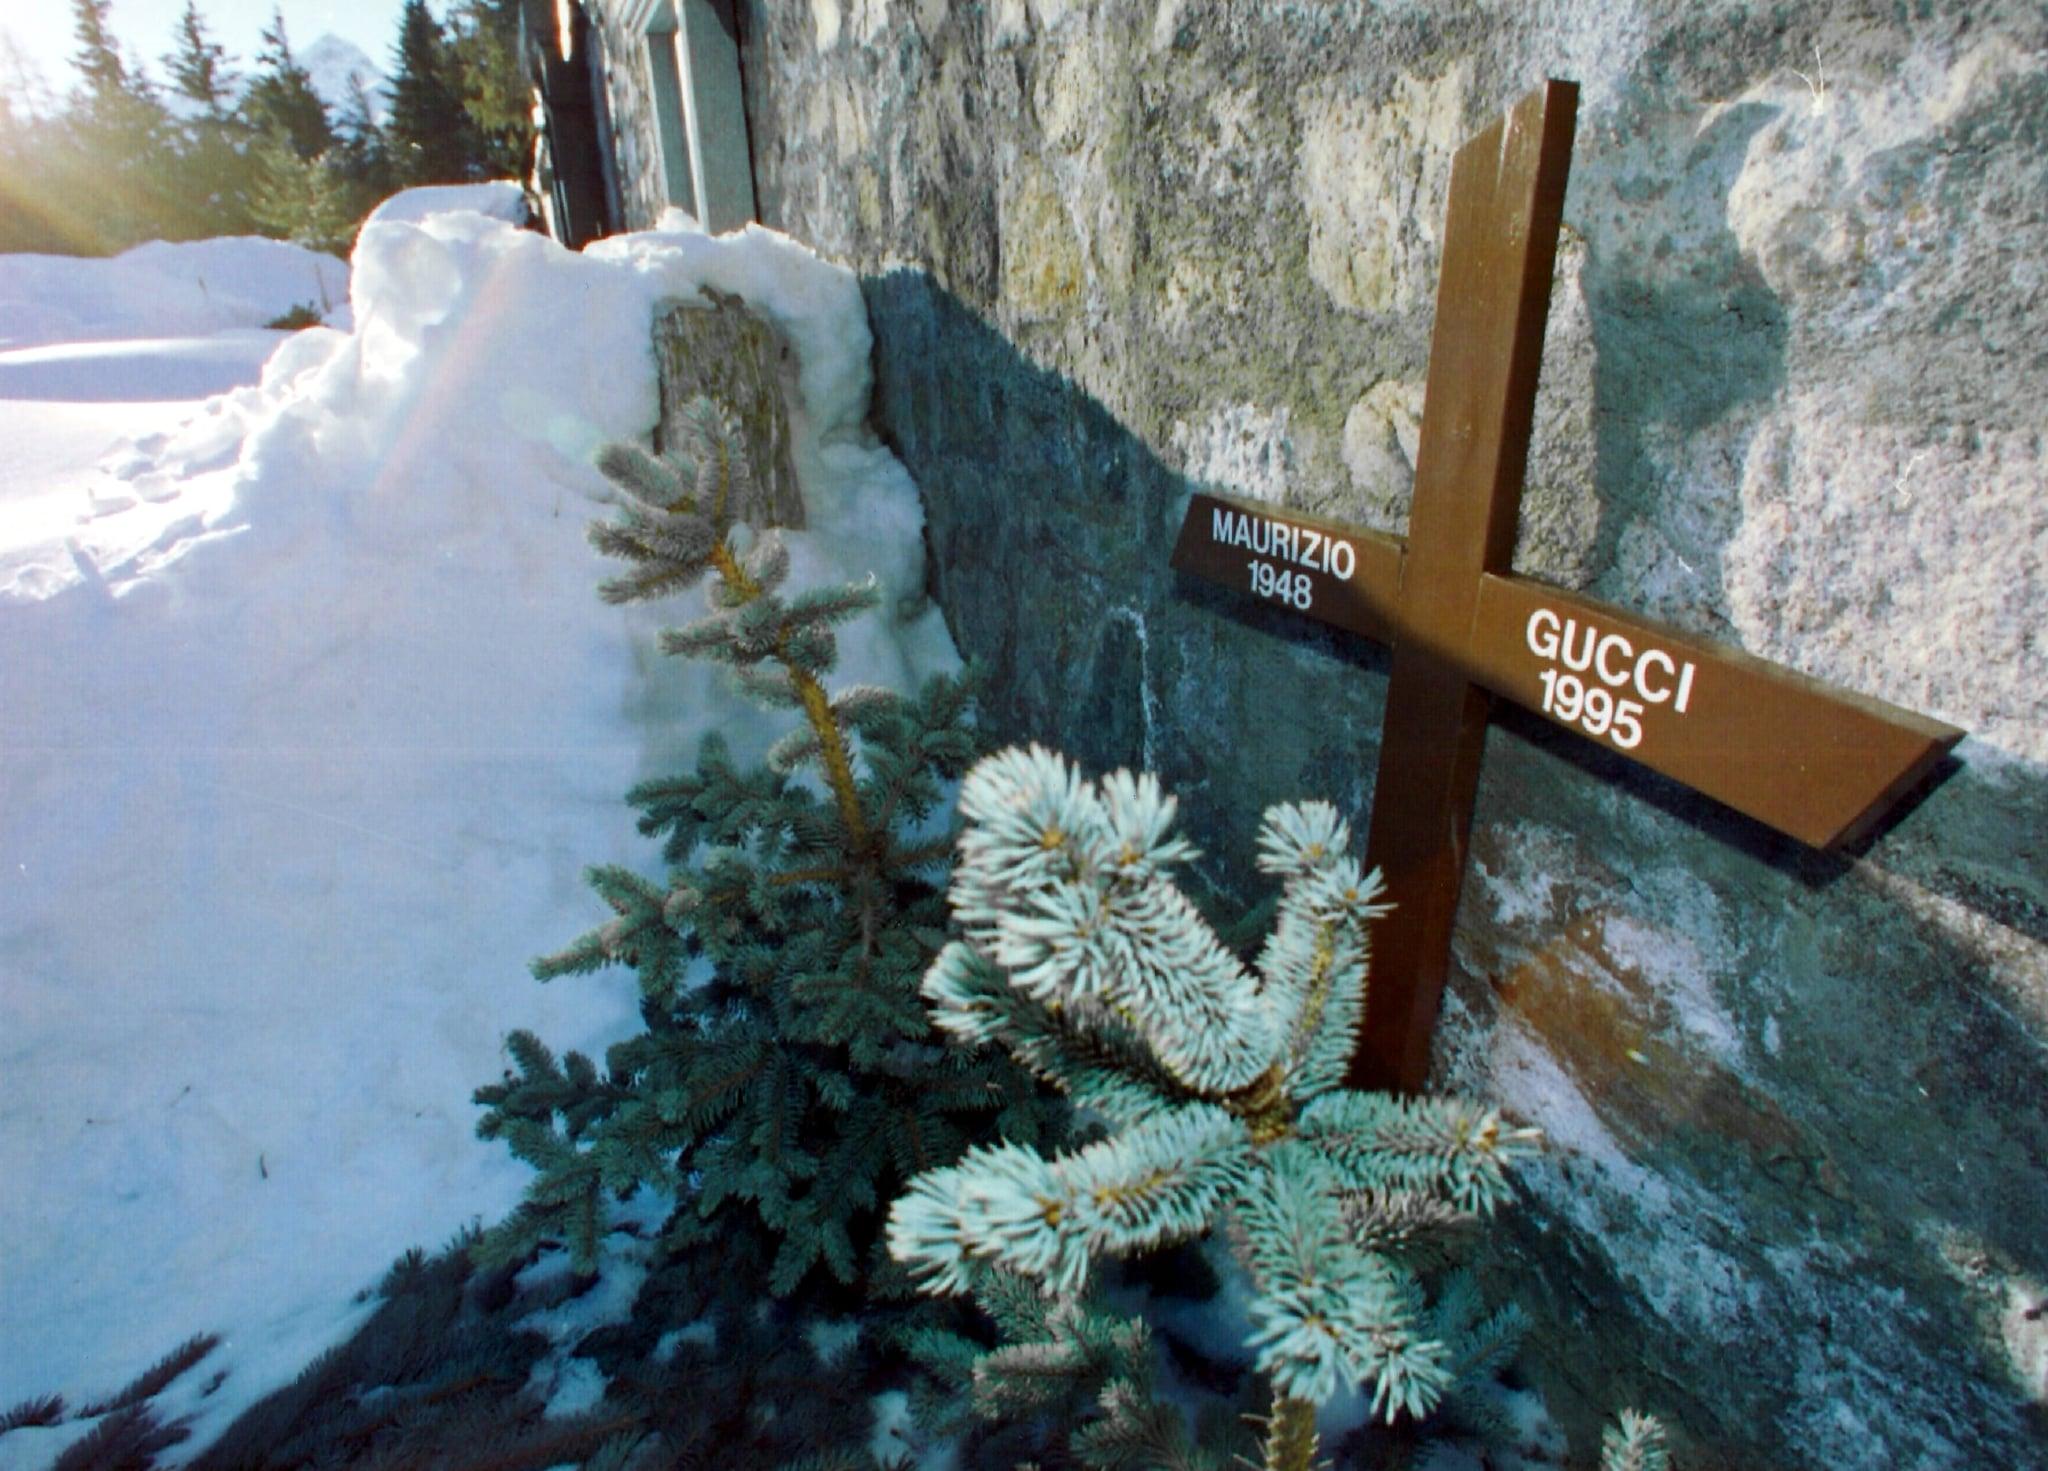 Grave of Maurizio Gucci in St. Moritz، 1997 (عکس از Blick / RDB / ullstein bild از طریق گتی ایماژ)